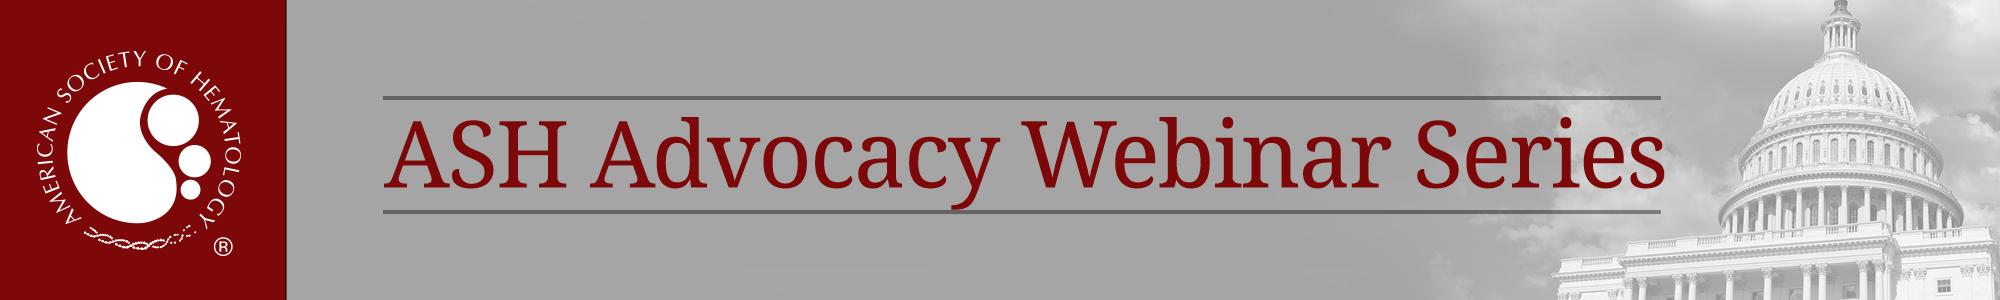 ASH Advocacy Webinar Series